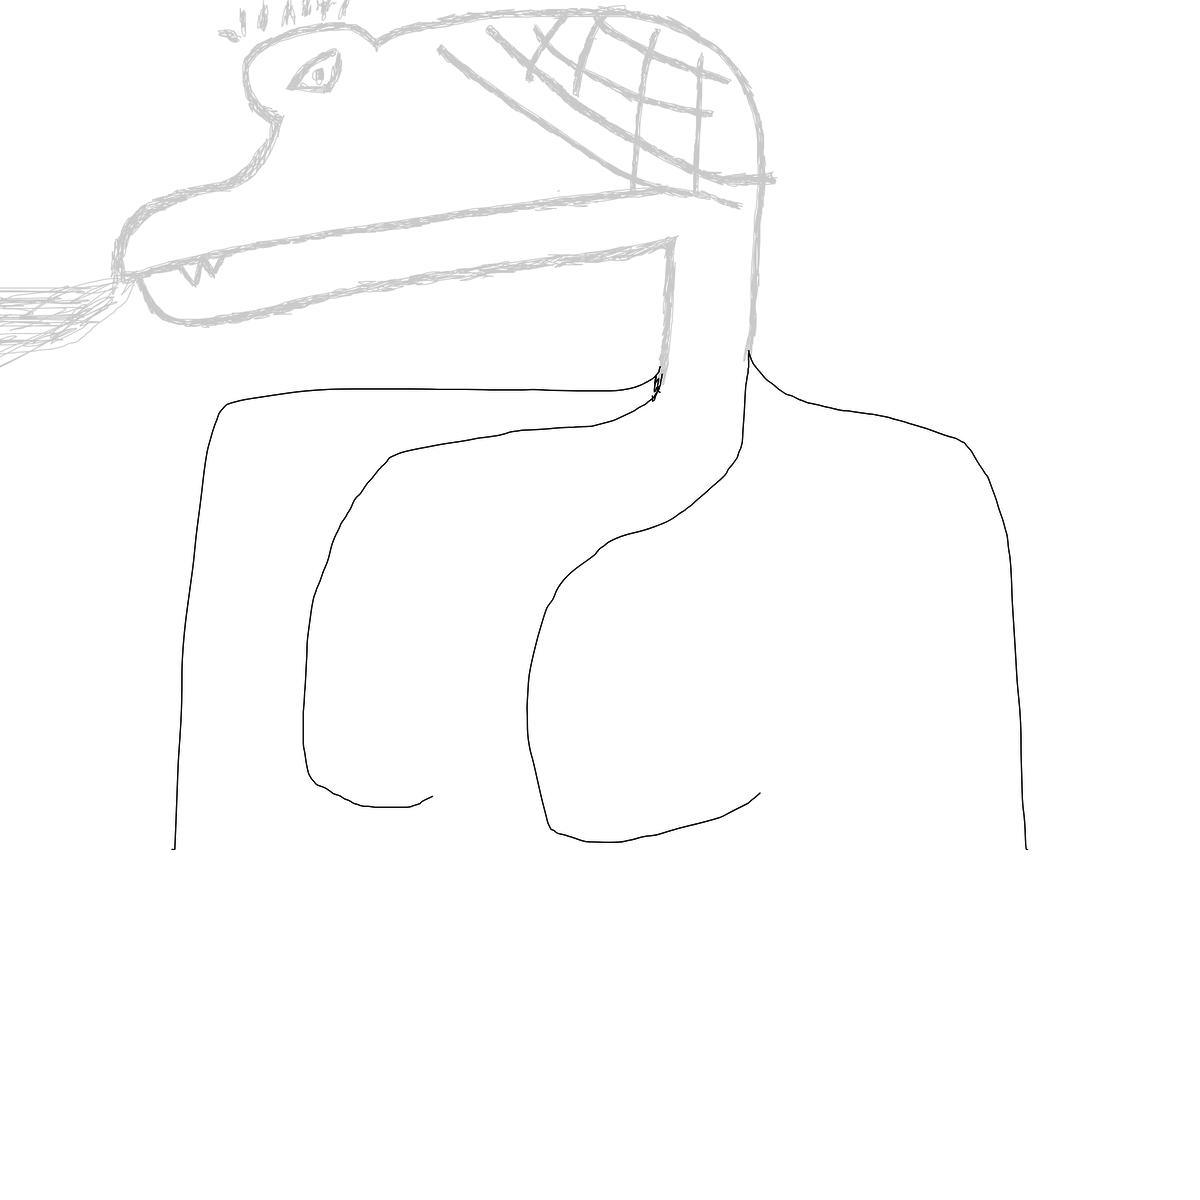 BAAAM drawing#23564 lat:46.5209121704101560lng: 6.6340646743774410